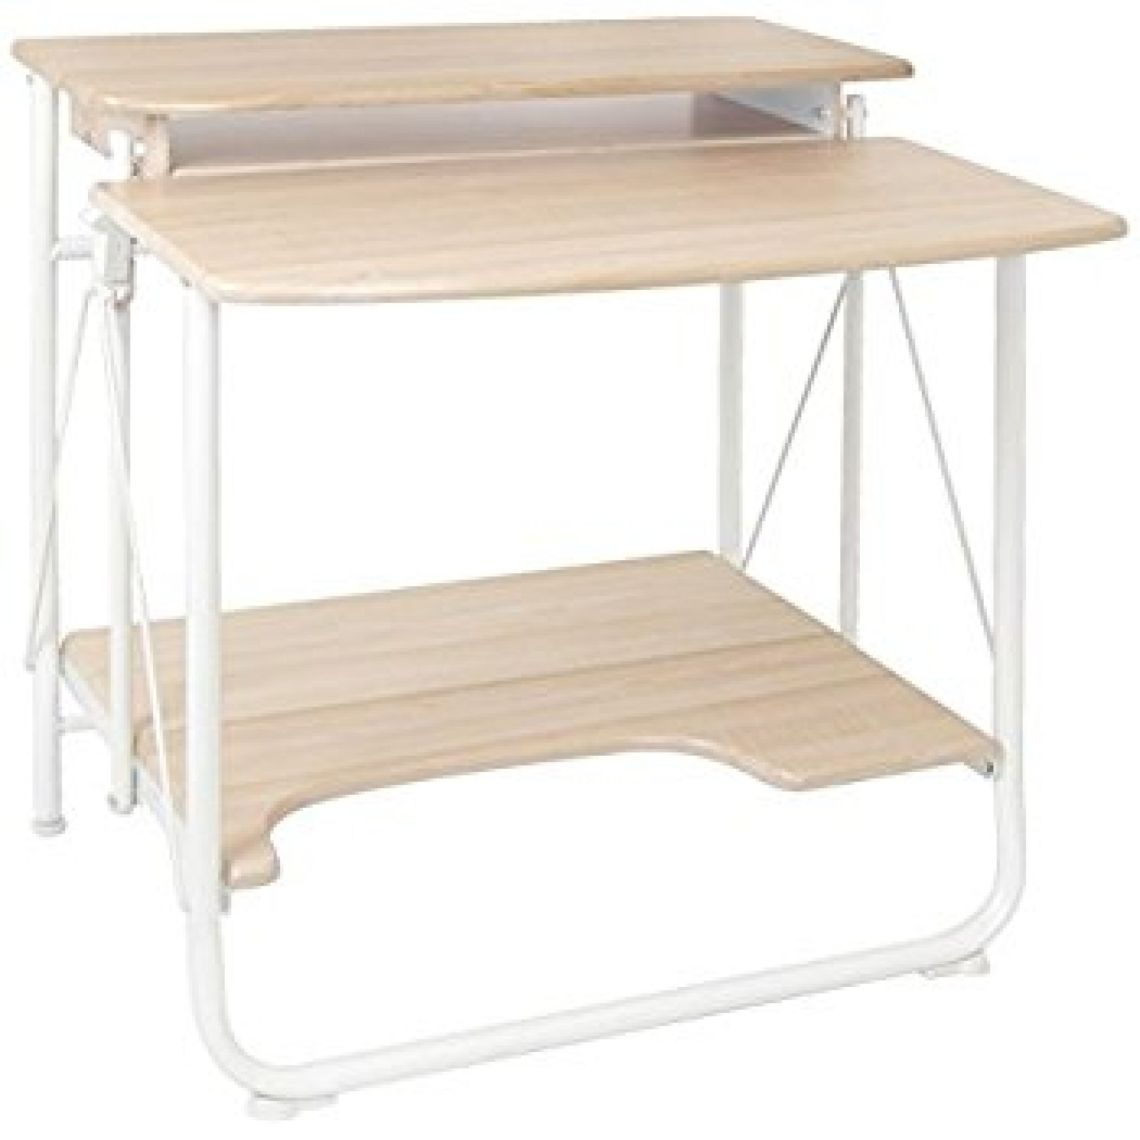 Amazon.com: Calico Designs 51236.0 Stow Away Folding Desk, White/Maple: Kitchen & Dining